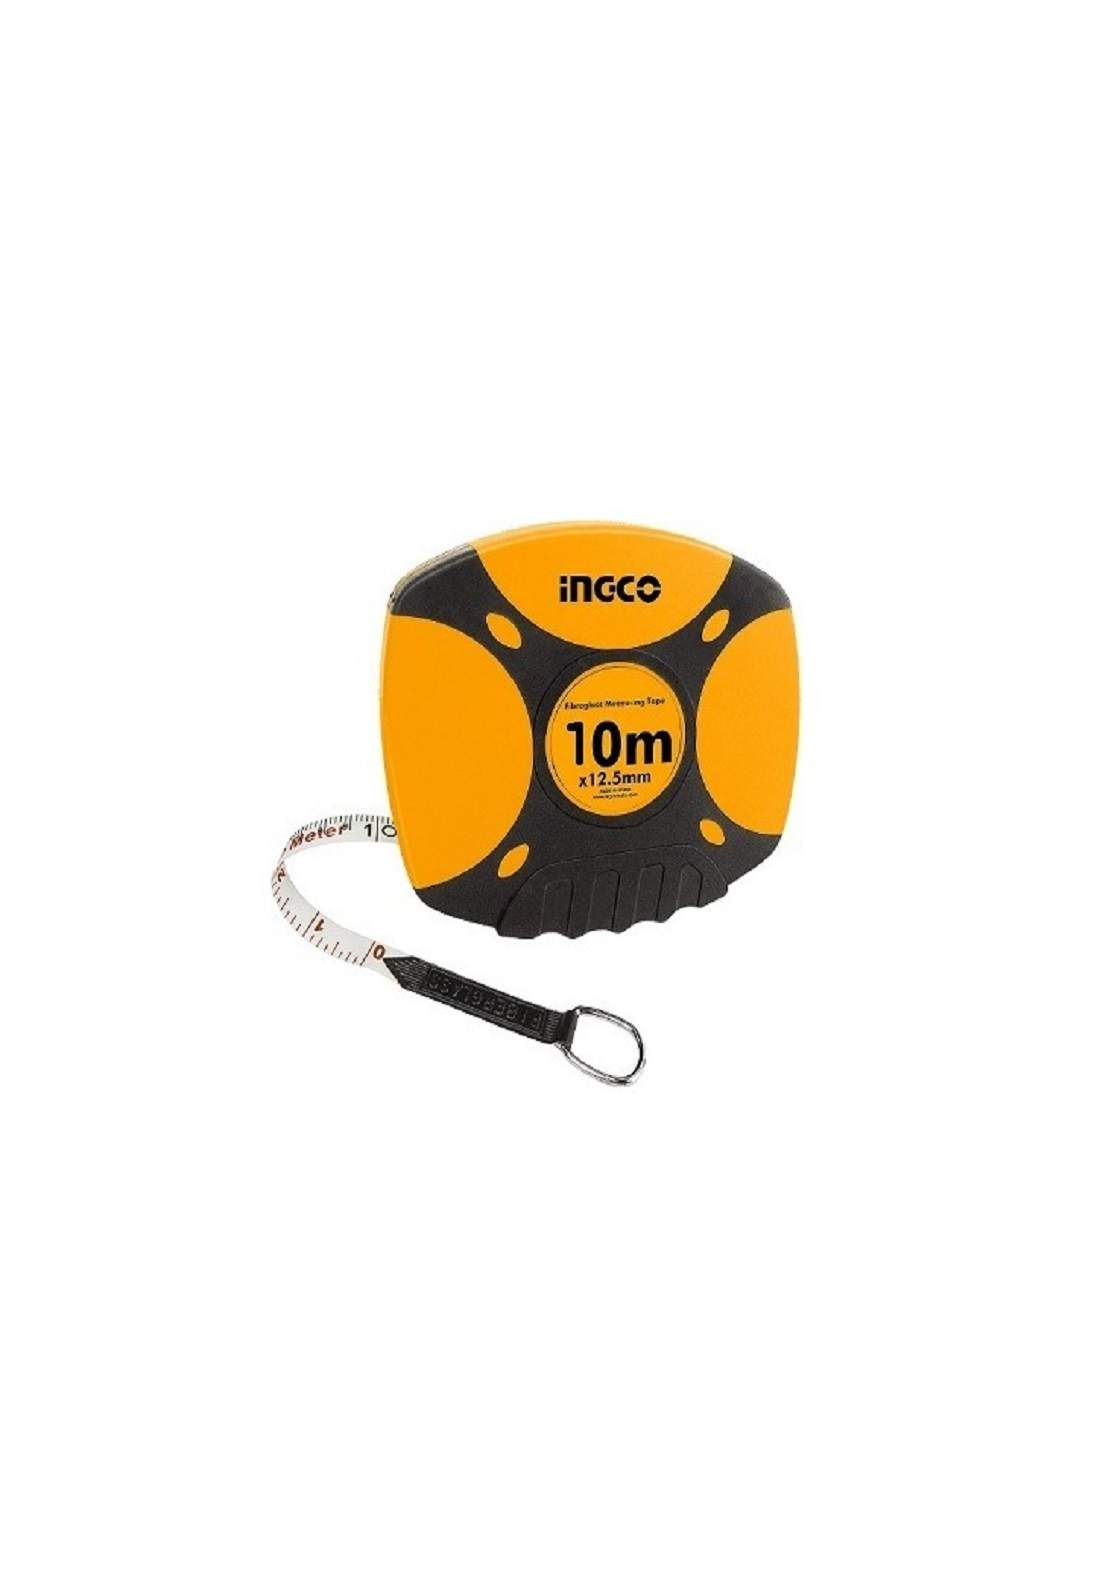 INGCO HFMT0110 10M Fibreglass Measuring Tape فيته قماش 10متر